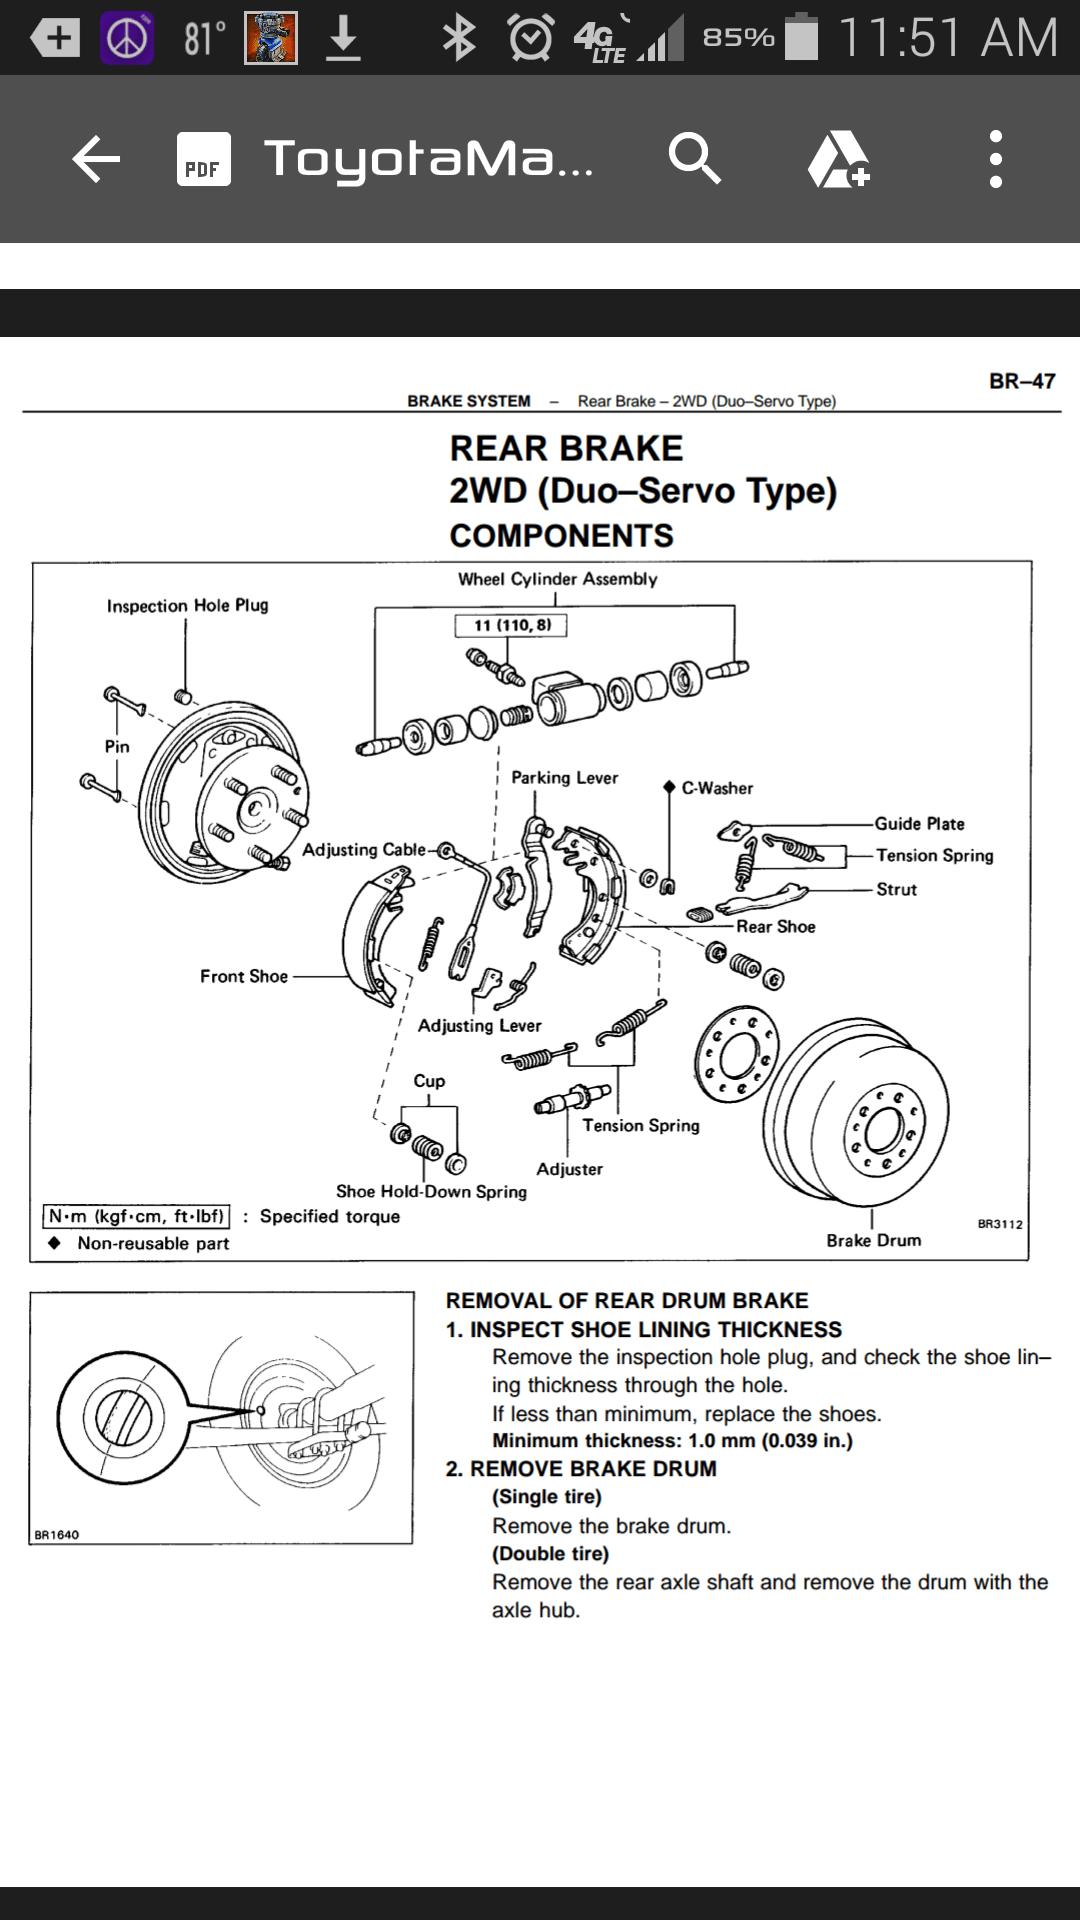 Drum Brake Tools